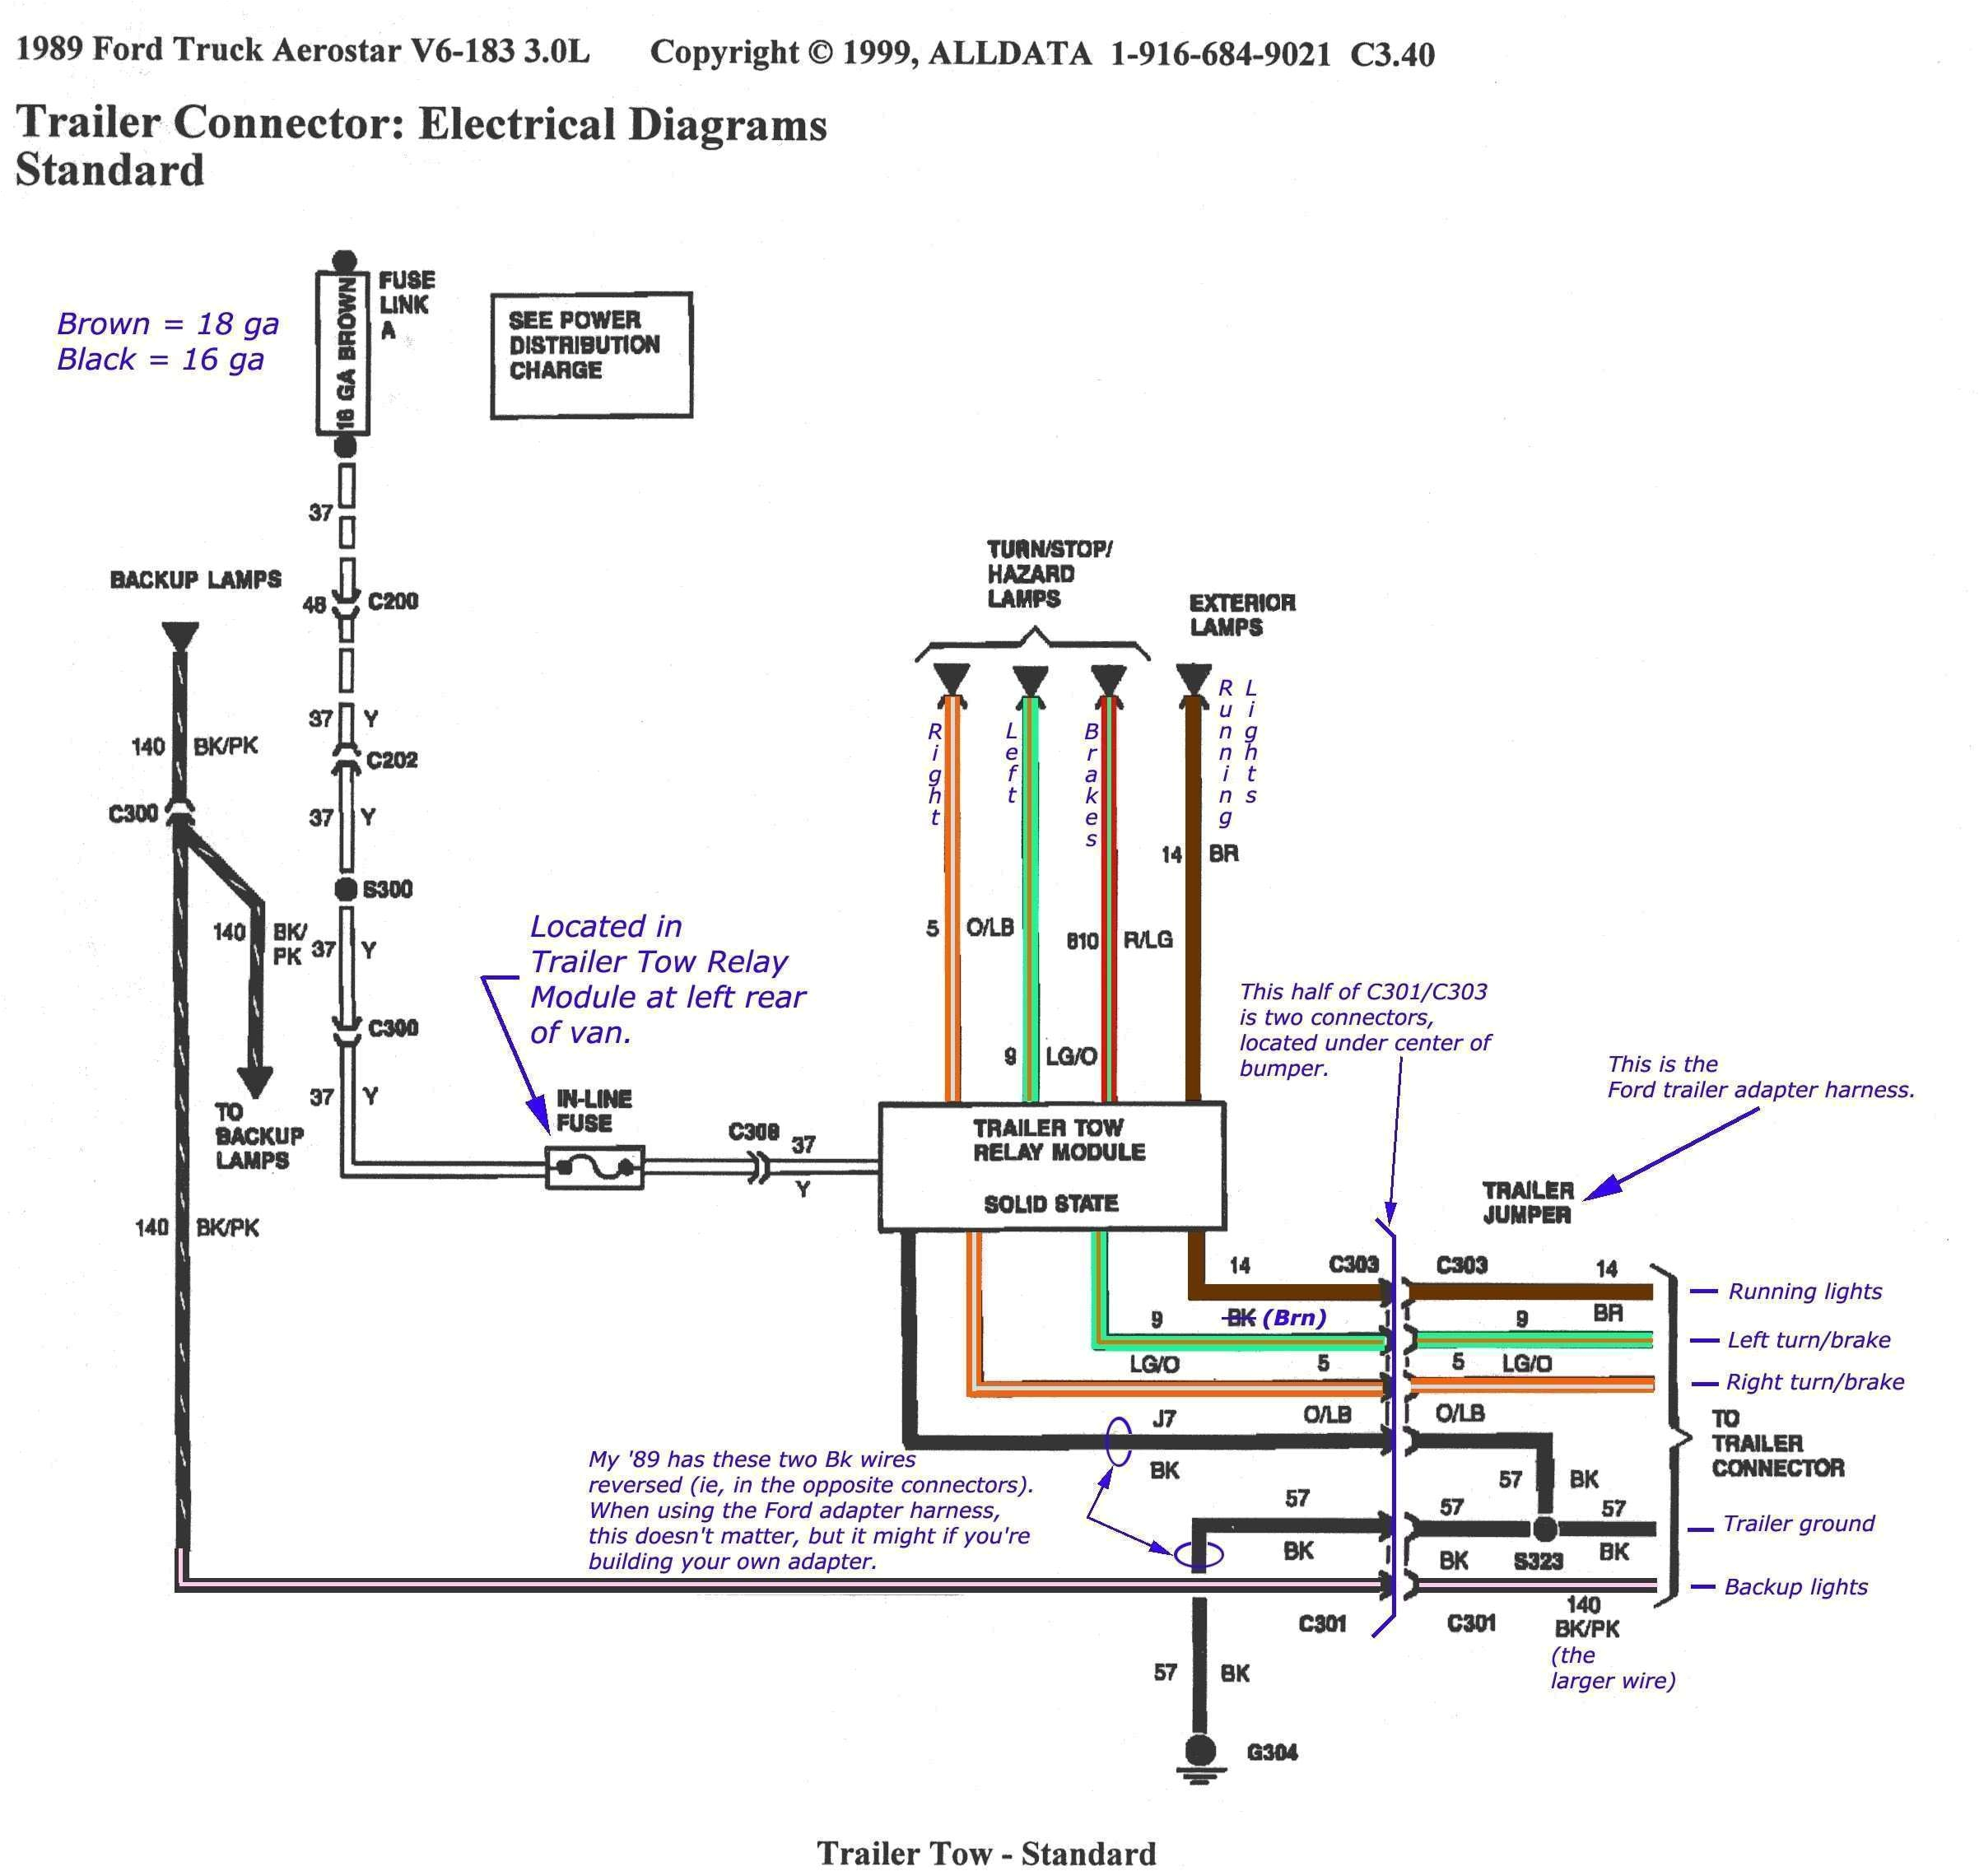 2013 e350 trailer wiring harness wiring diagram expert e250 trailer wire harness diagram get free image about wiring